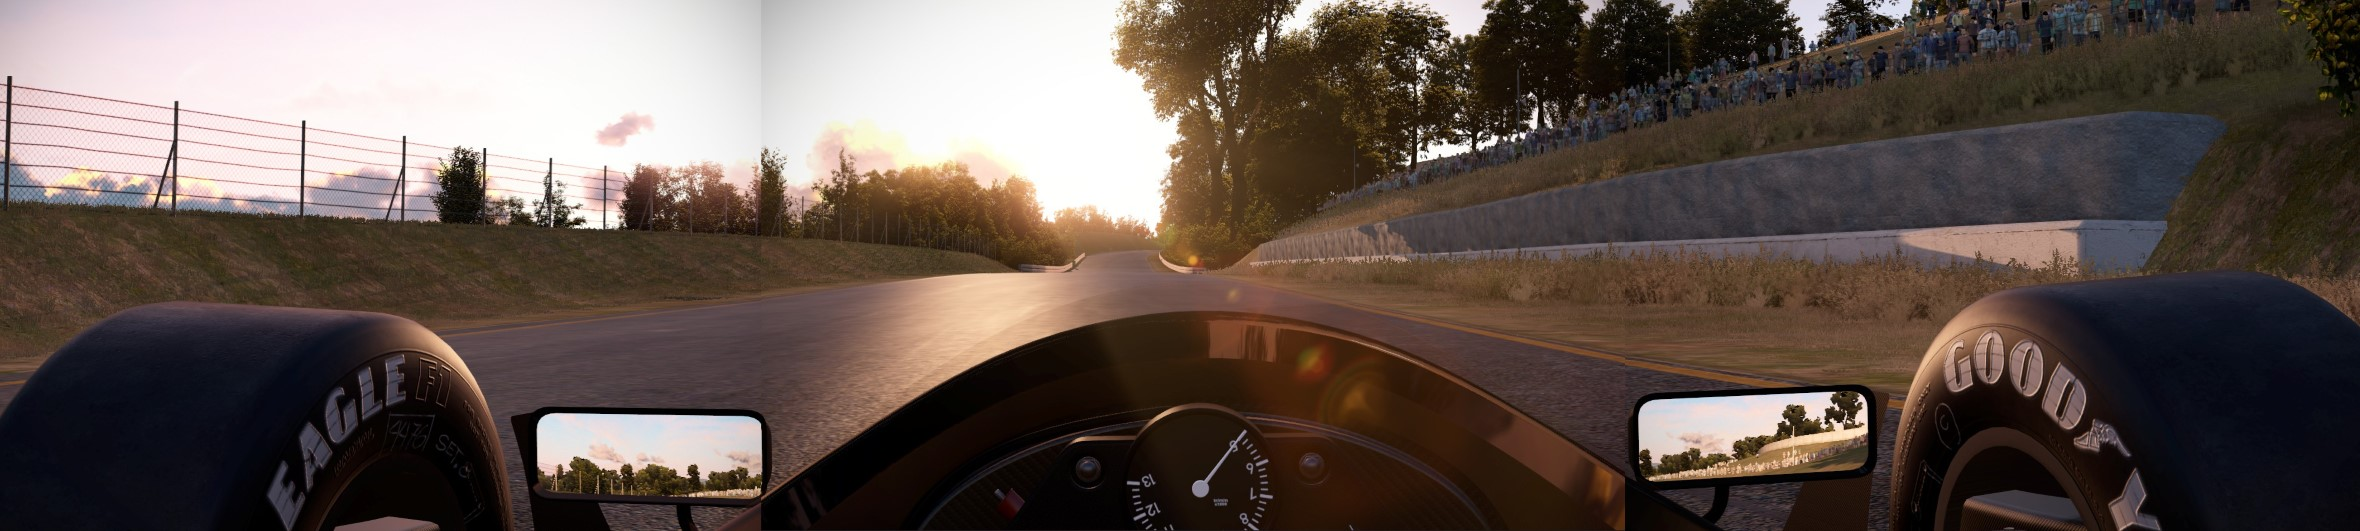 20200613225849_1-custom-jpg Automobilista 2   Share Your Screenshots